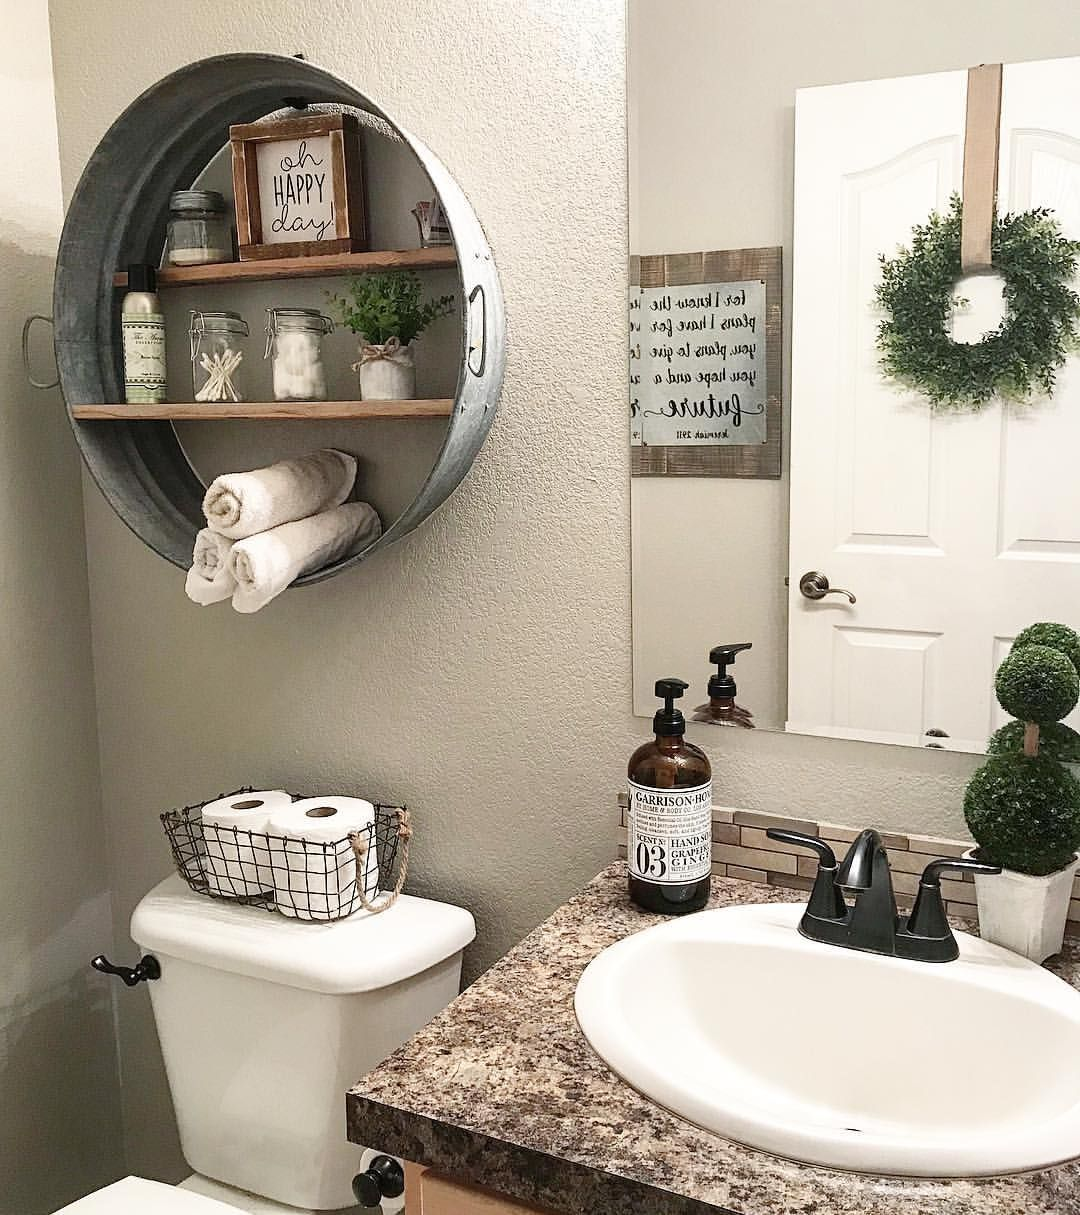 Pin By Kathryn Karr On Bathroom Redo In 2019 Modern